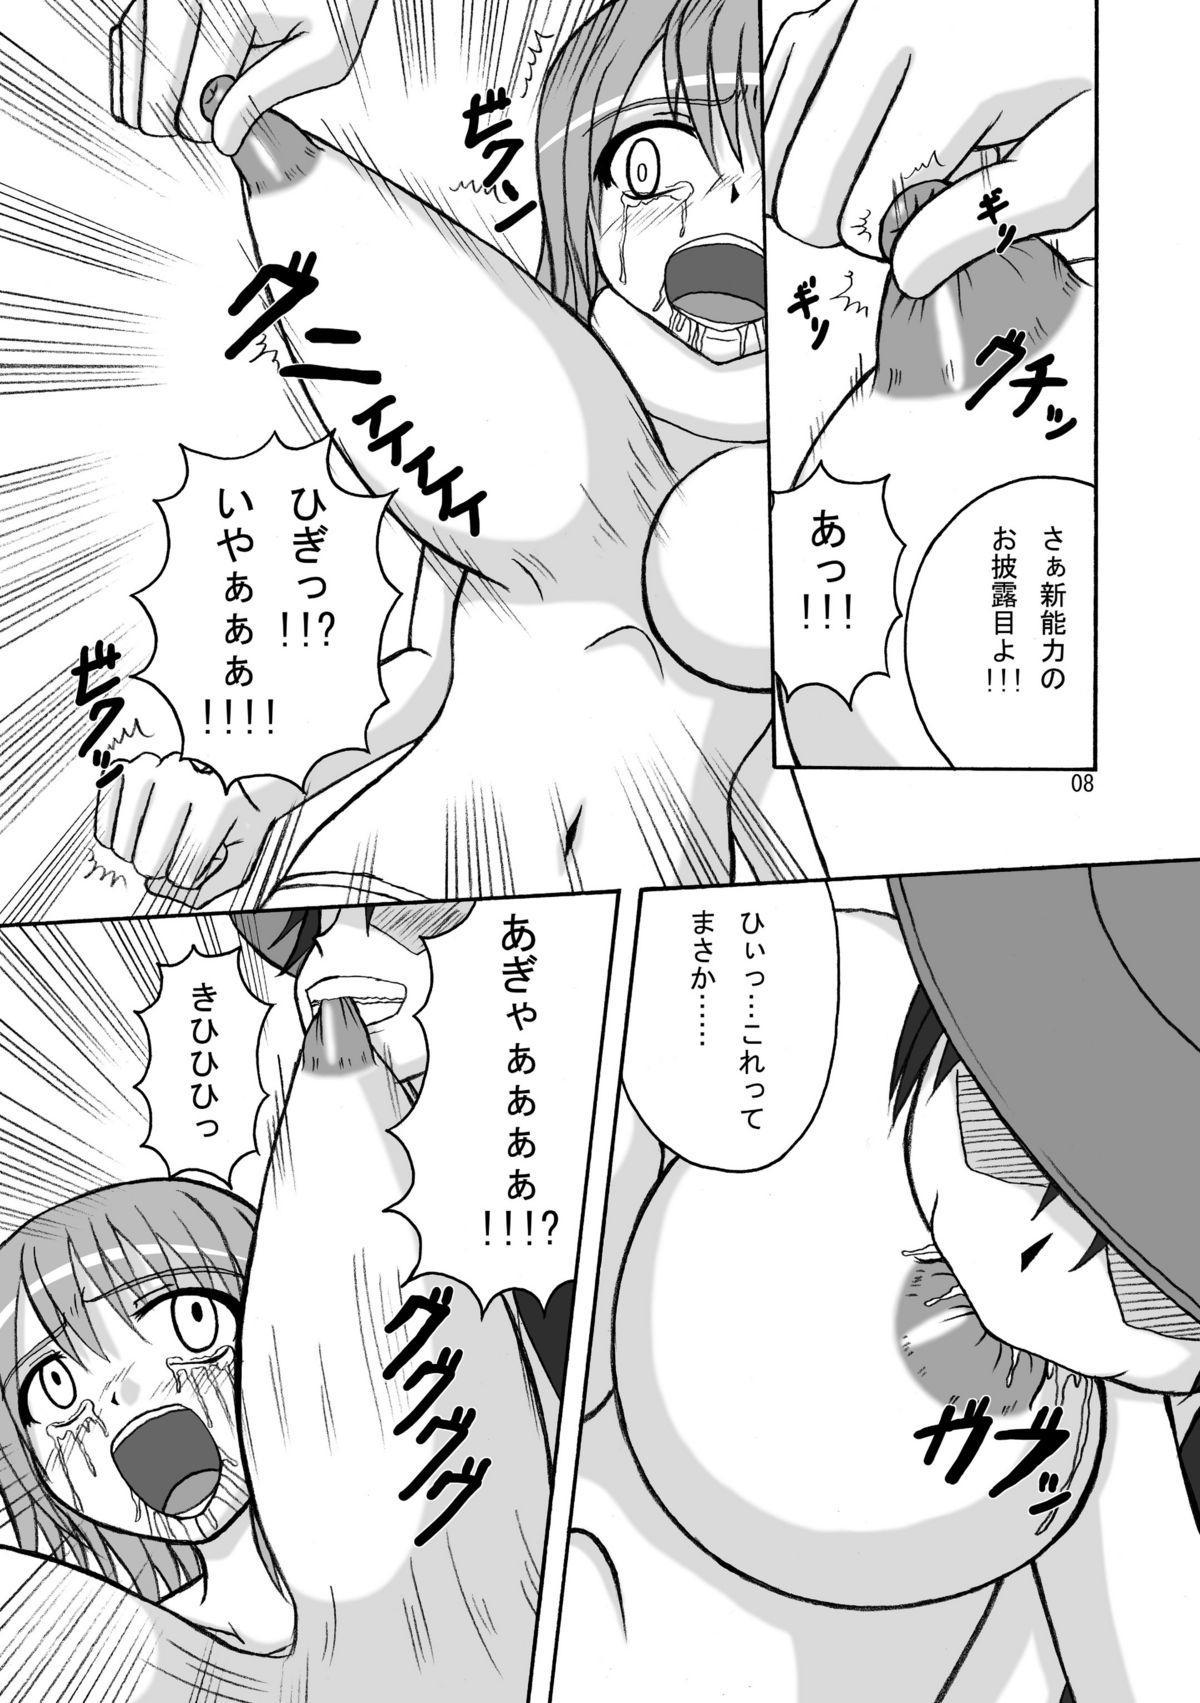 Jump Tales 5 San P Nami Baku More Condom Nami vs Gear3 vs Marunomi Hebihime 6